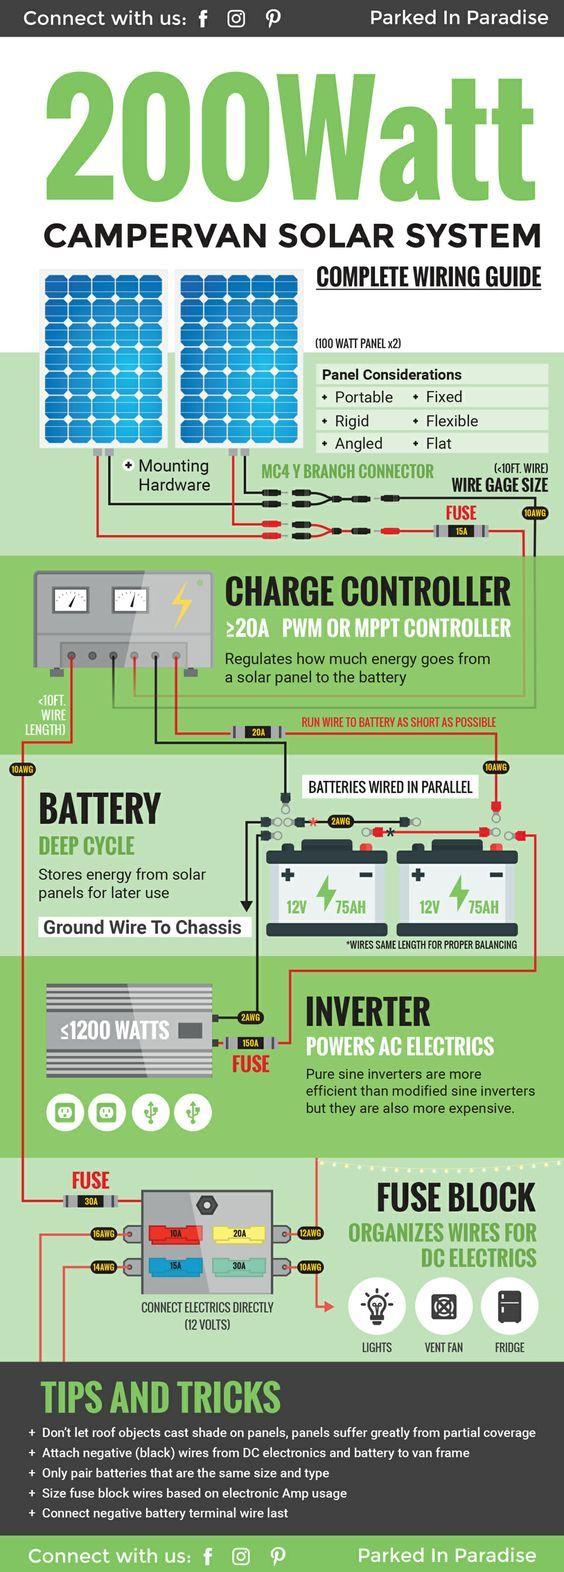 small resolution of solar calculator and diy wiring diagrams vw lt 35 motorhome upgrade solar panel system campervan solar panels